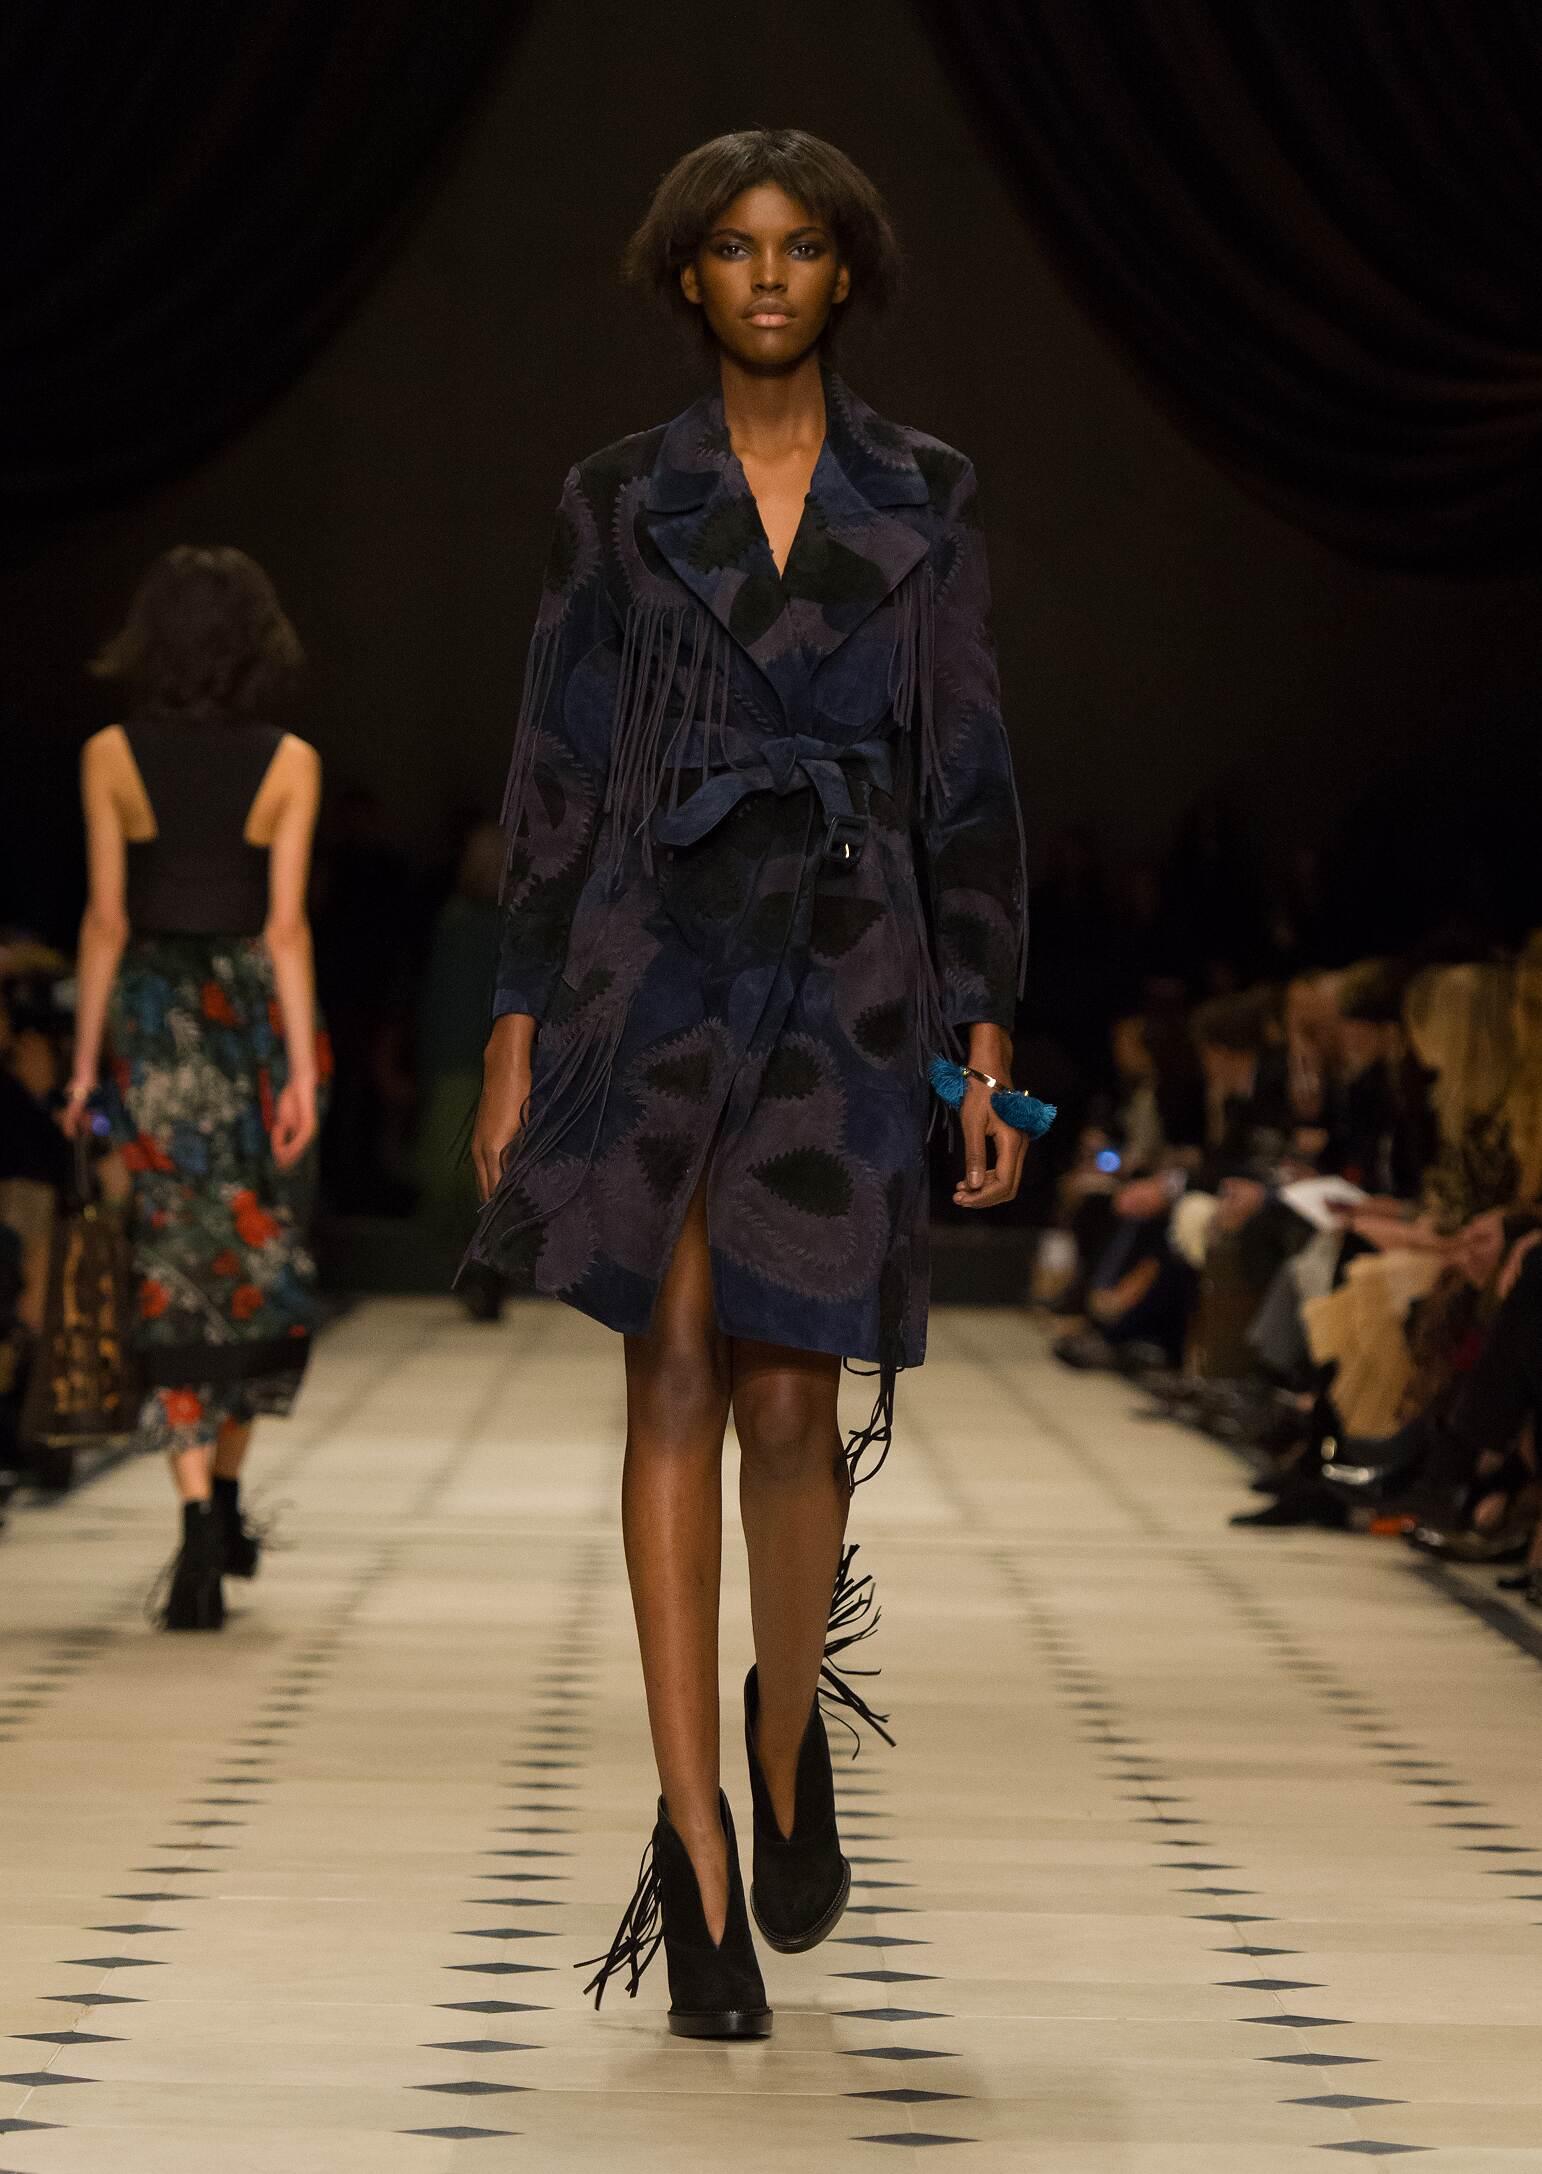 Burberry Prorsum Collection London Fashion Week Womenswear